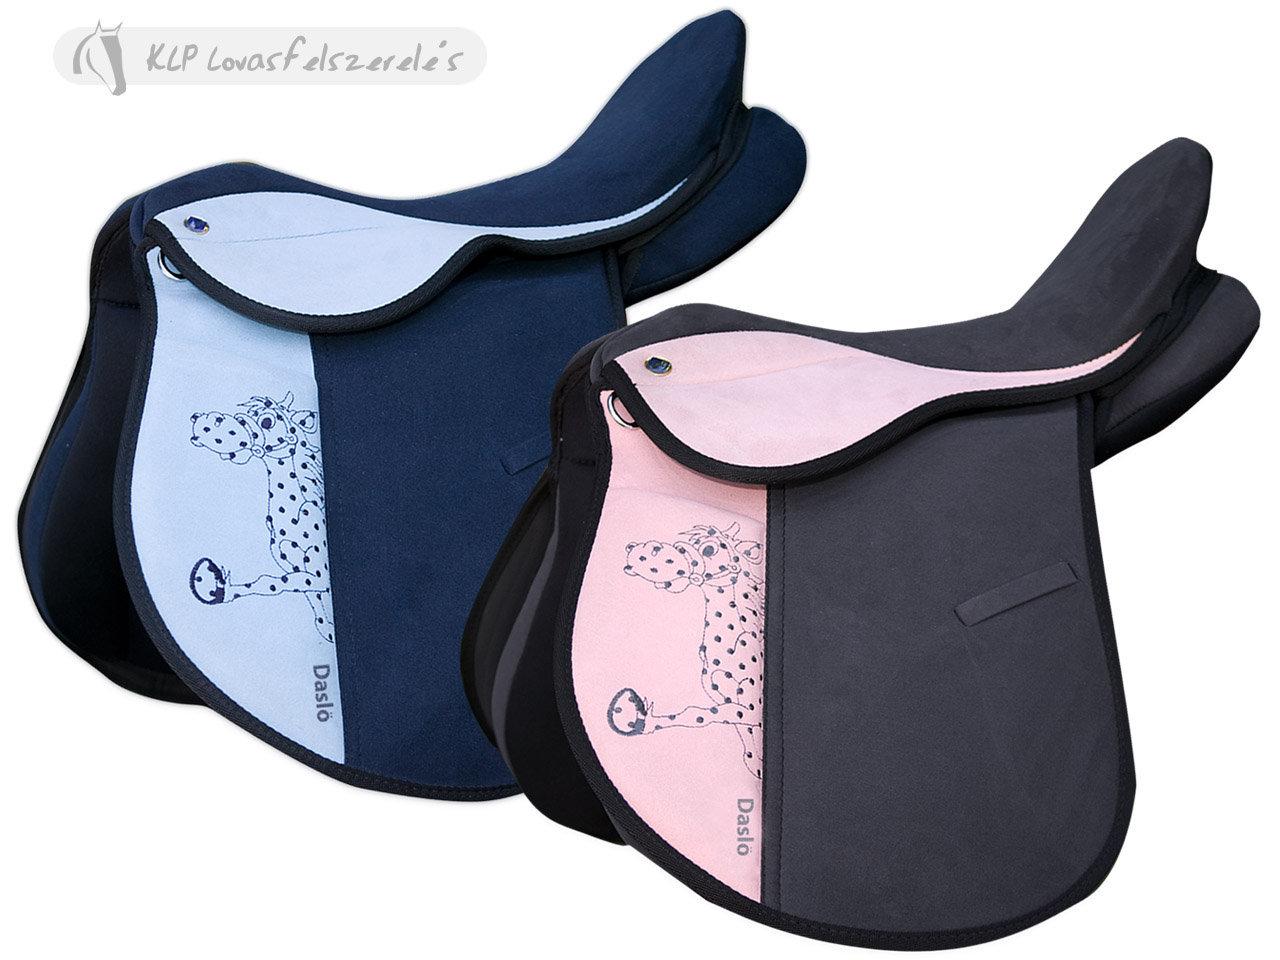 Daslo Bicolour Synthetic Saddle